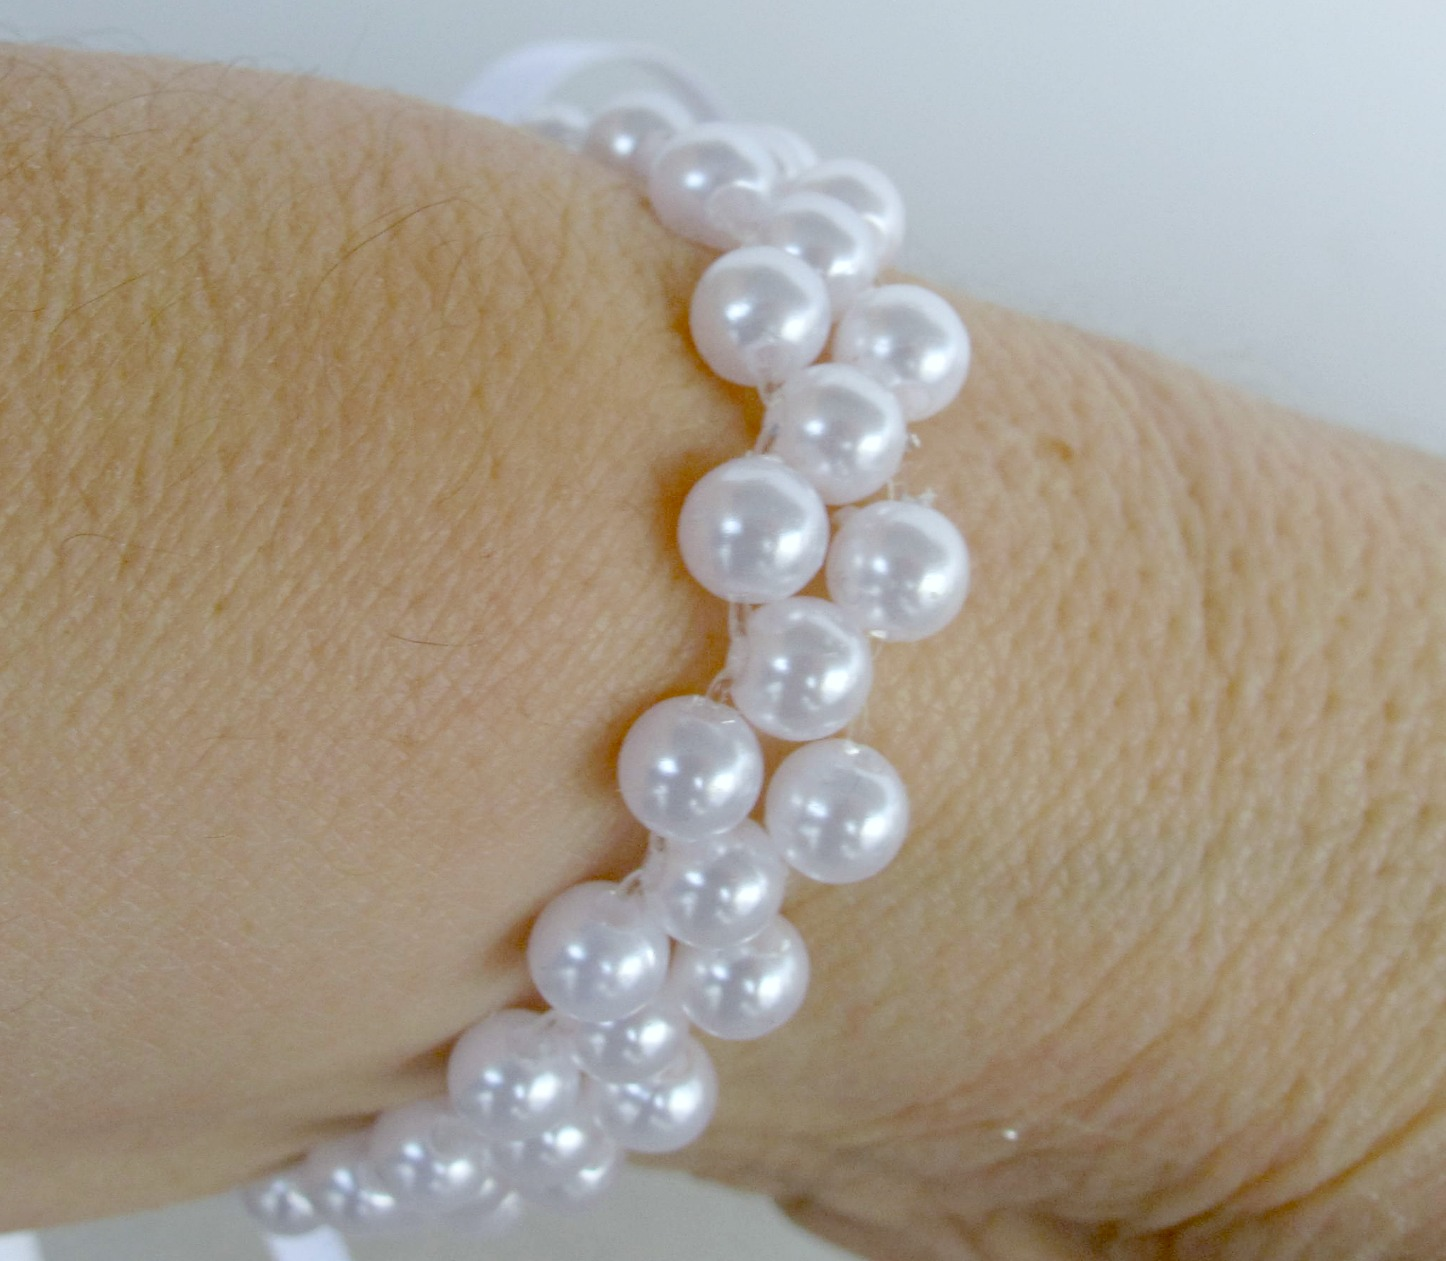 how to make a wrist corsage on a pearl bracelet